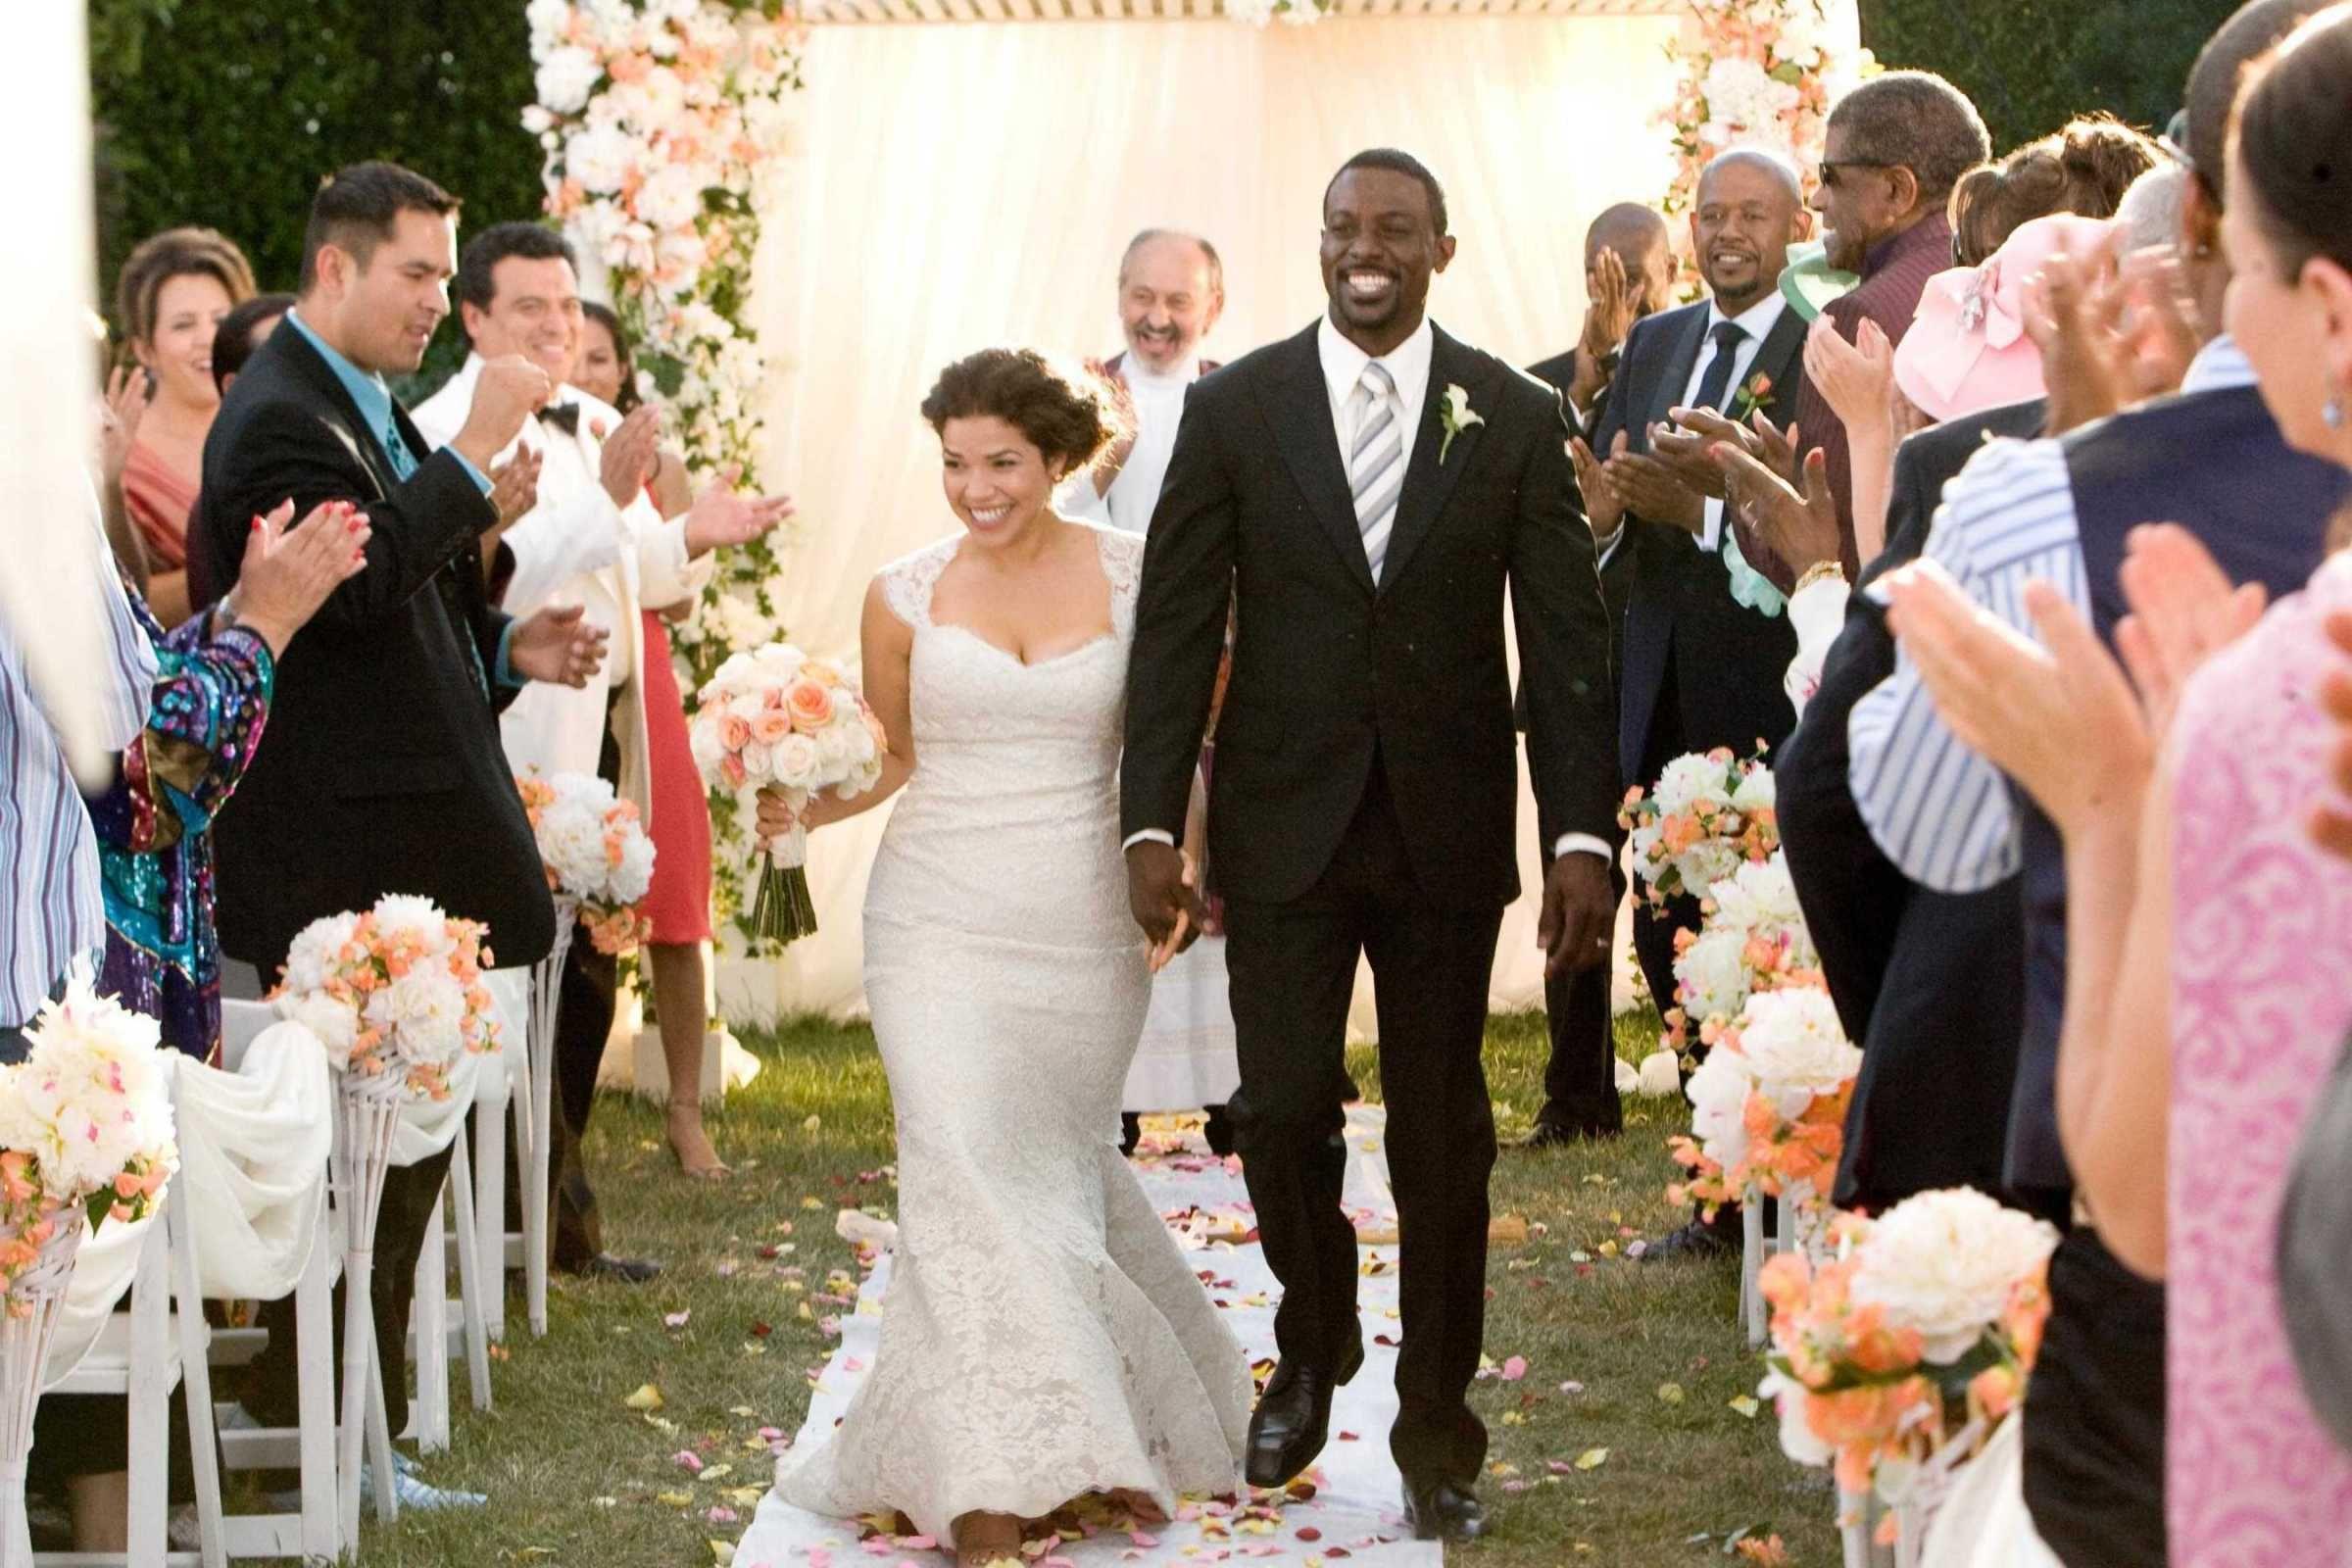 Reel Images Our Family Wedding Movie Wedding Dresses Custom Wedding Gown Wedding Dress Inspiration